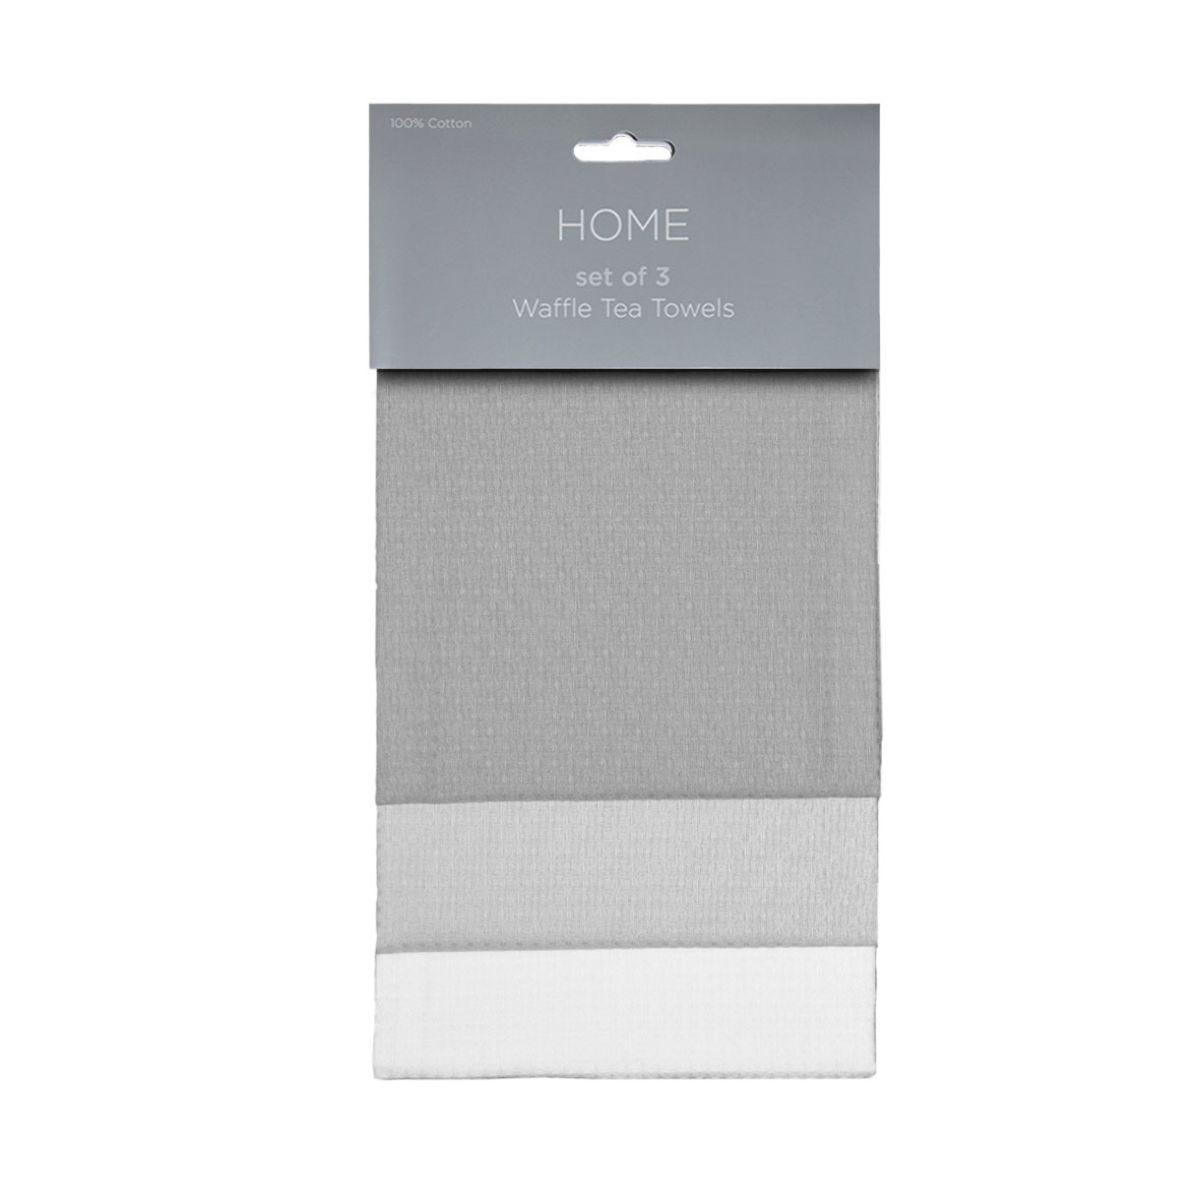 Waffle Tea Towels Set of 3 - Grey Mix